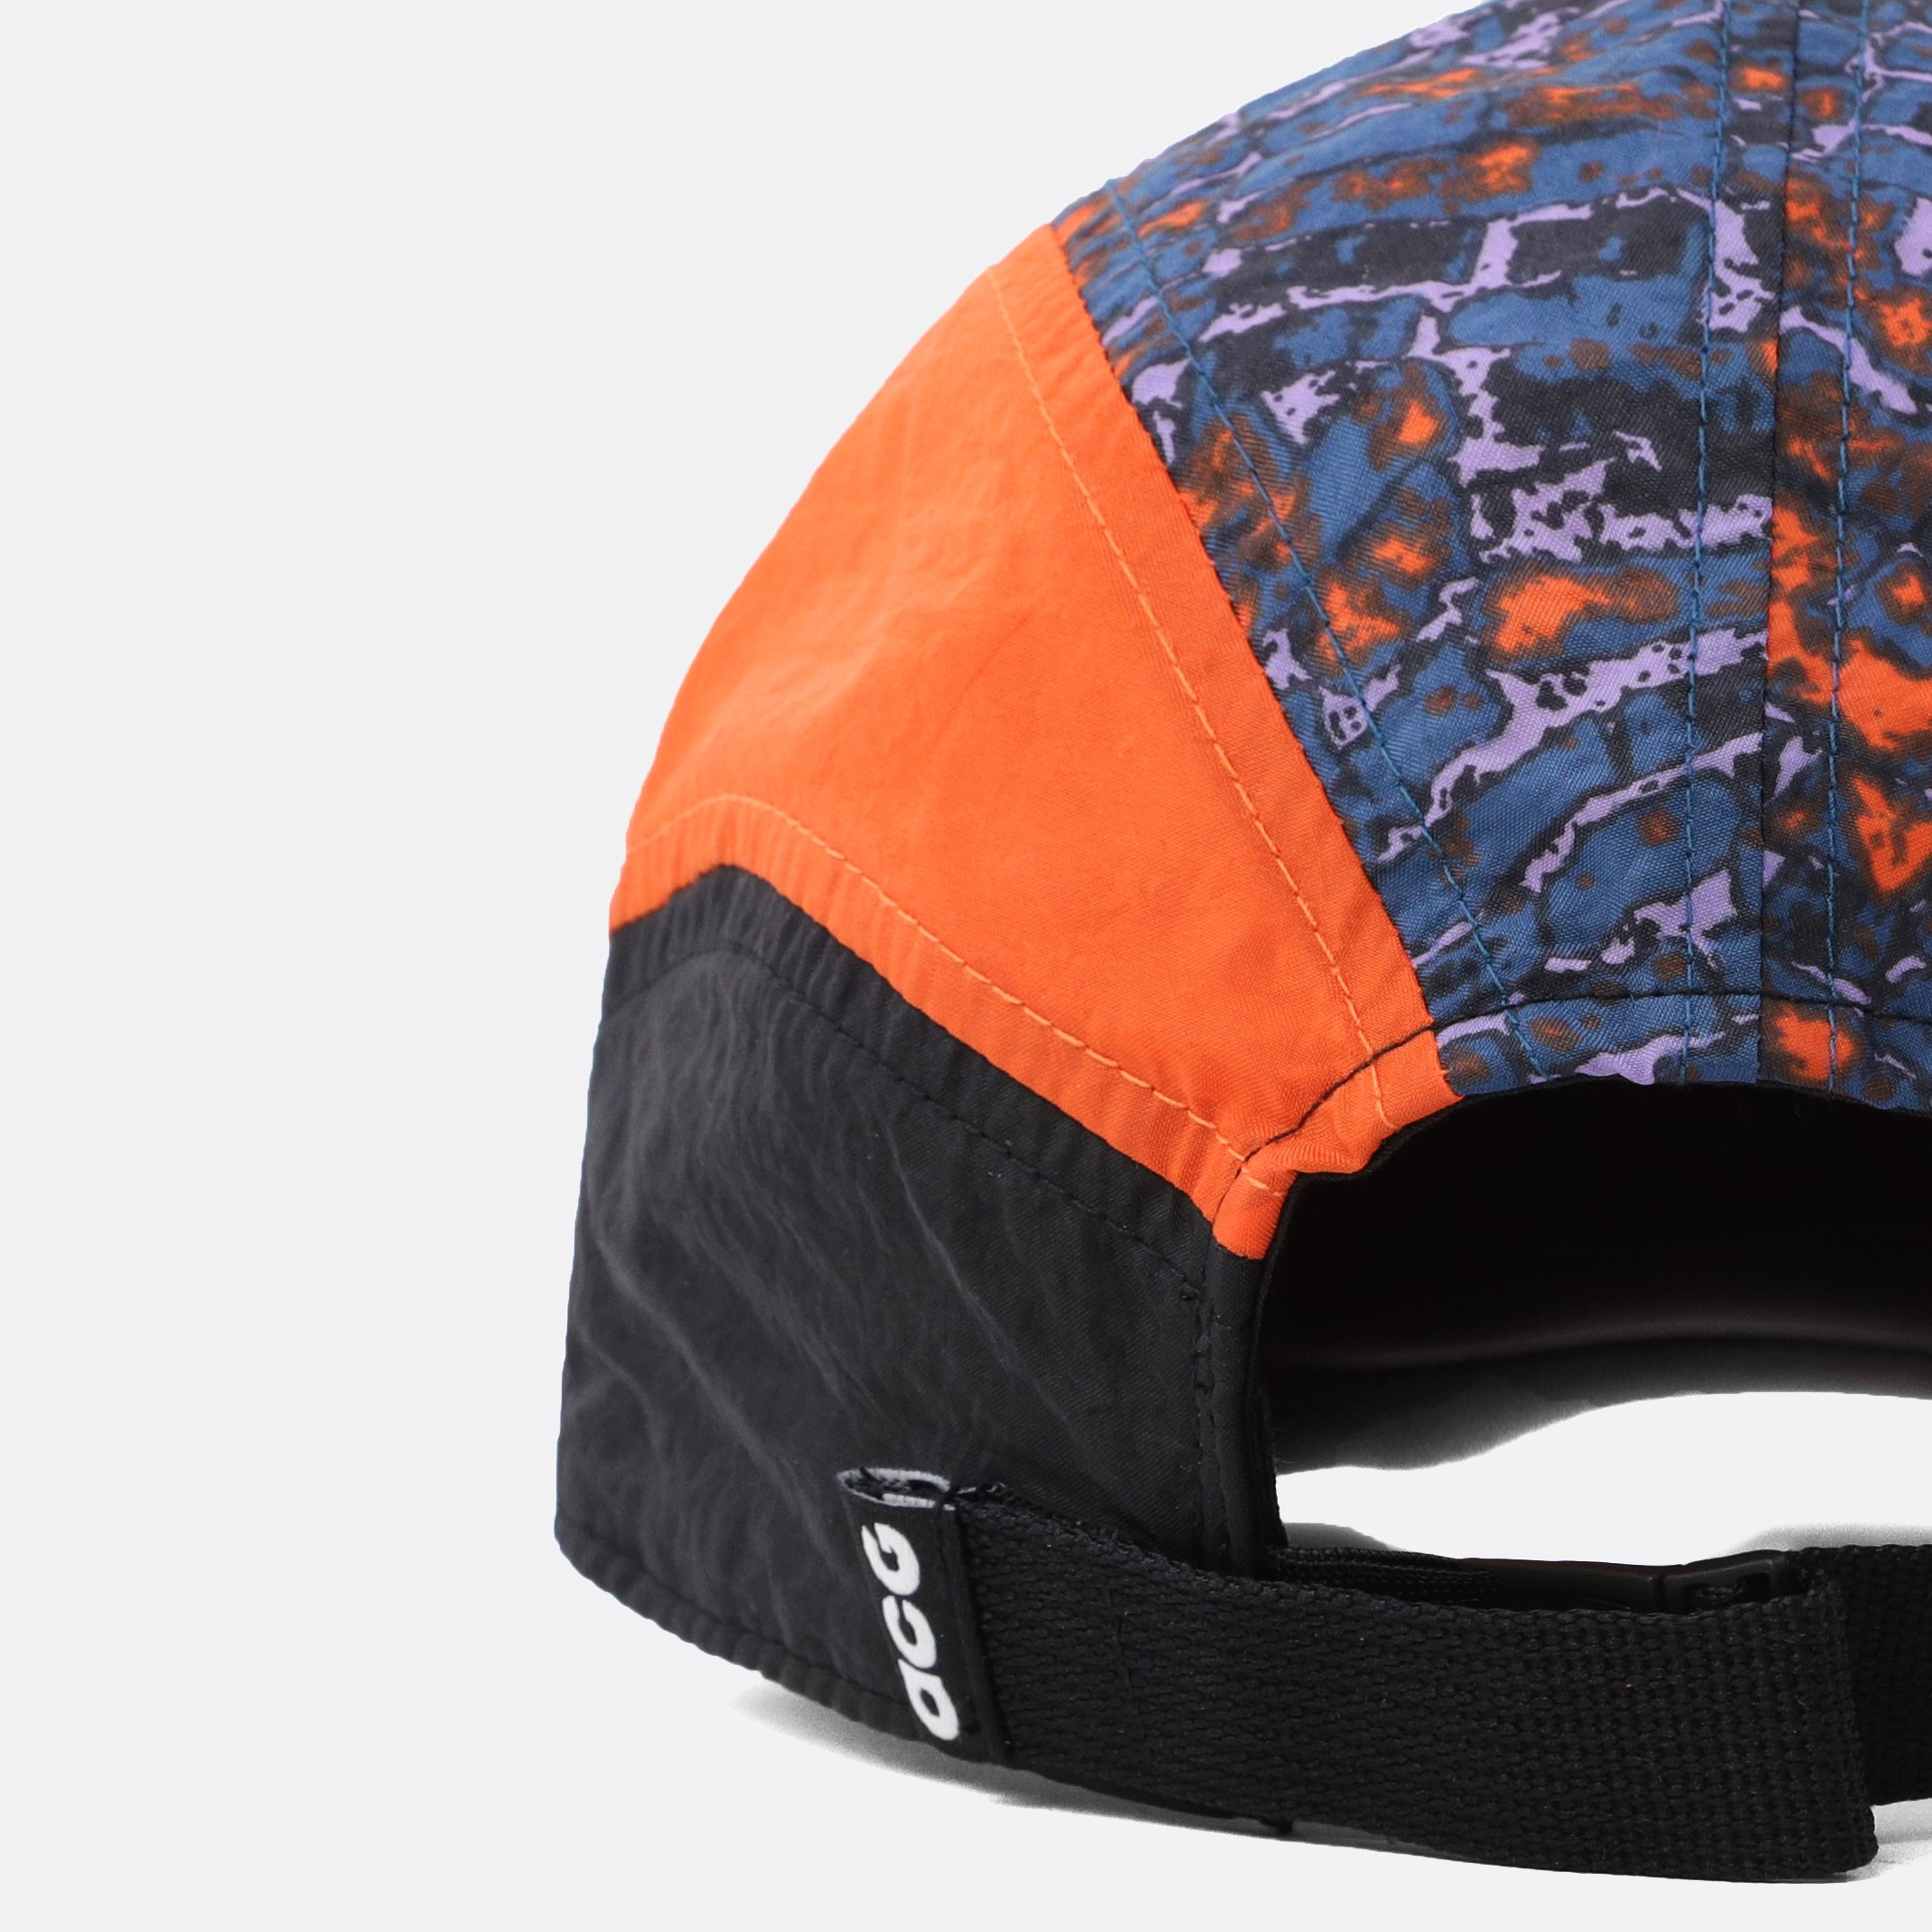 580a96a2 NIKE /. ACG TAILWIND CAP G1 BLACK / SAFETY ORANGE. 21 €